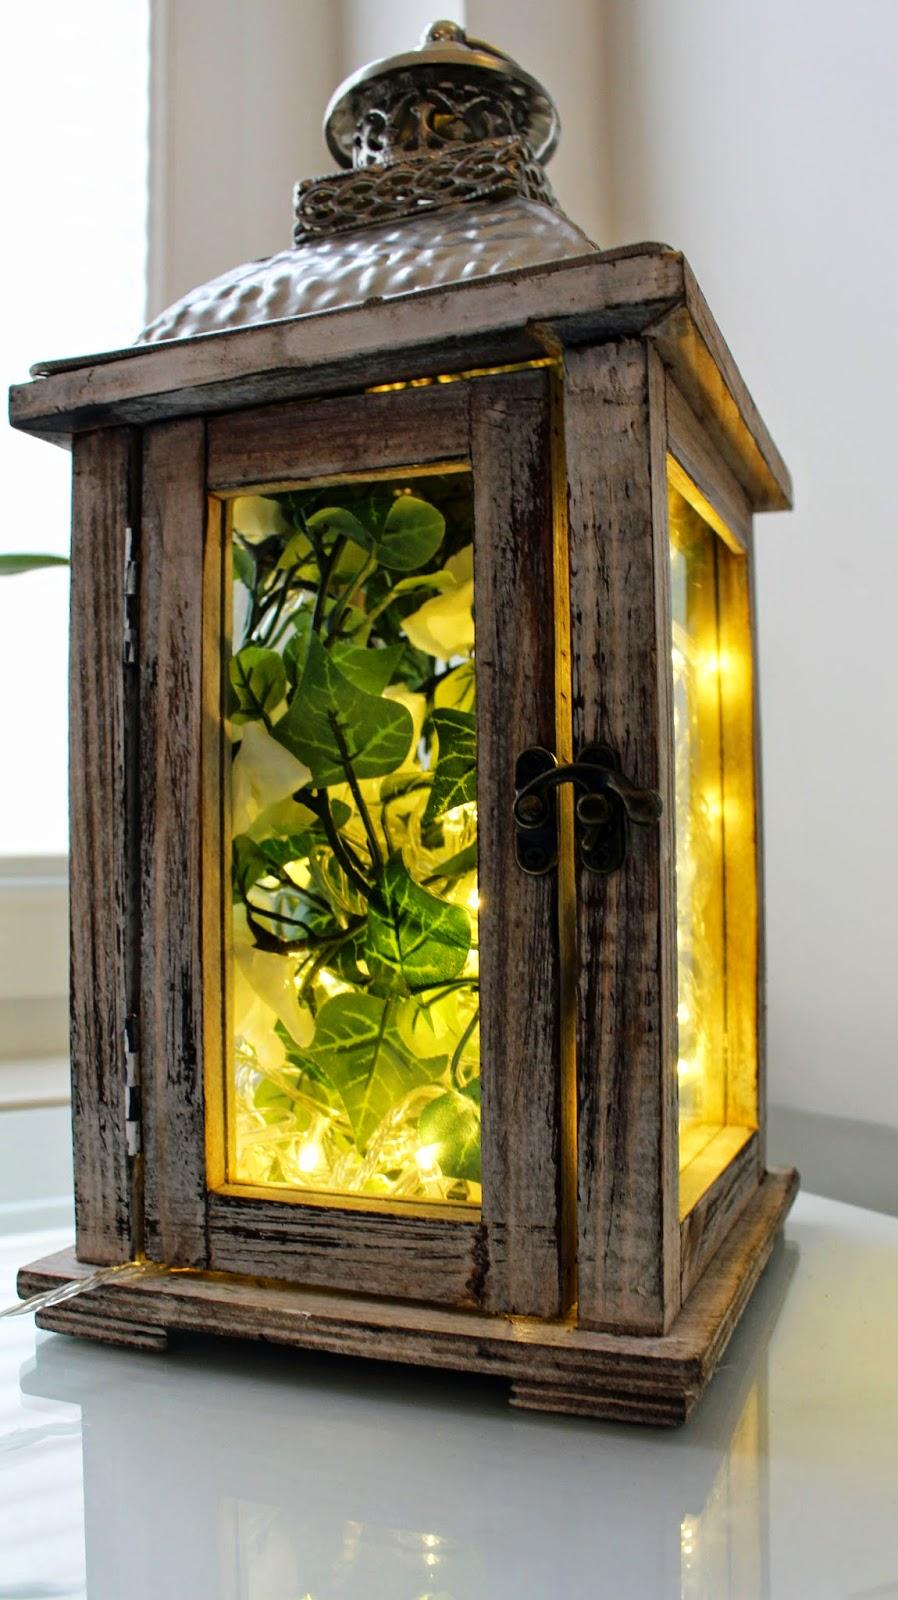 Laterne dekorieren frhling fabulous valery madelyn for Laterne dekorieren herbst